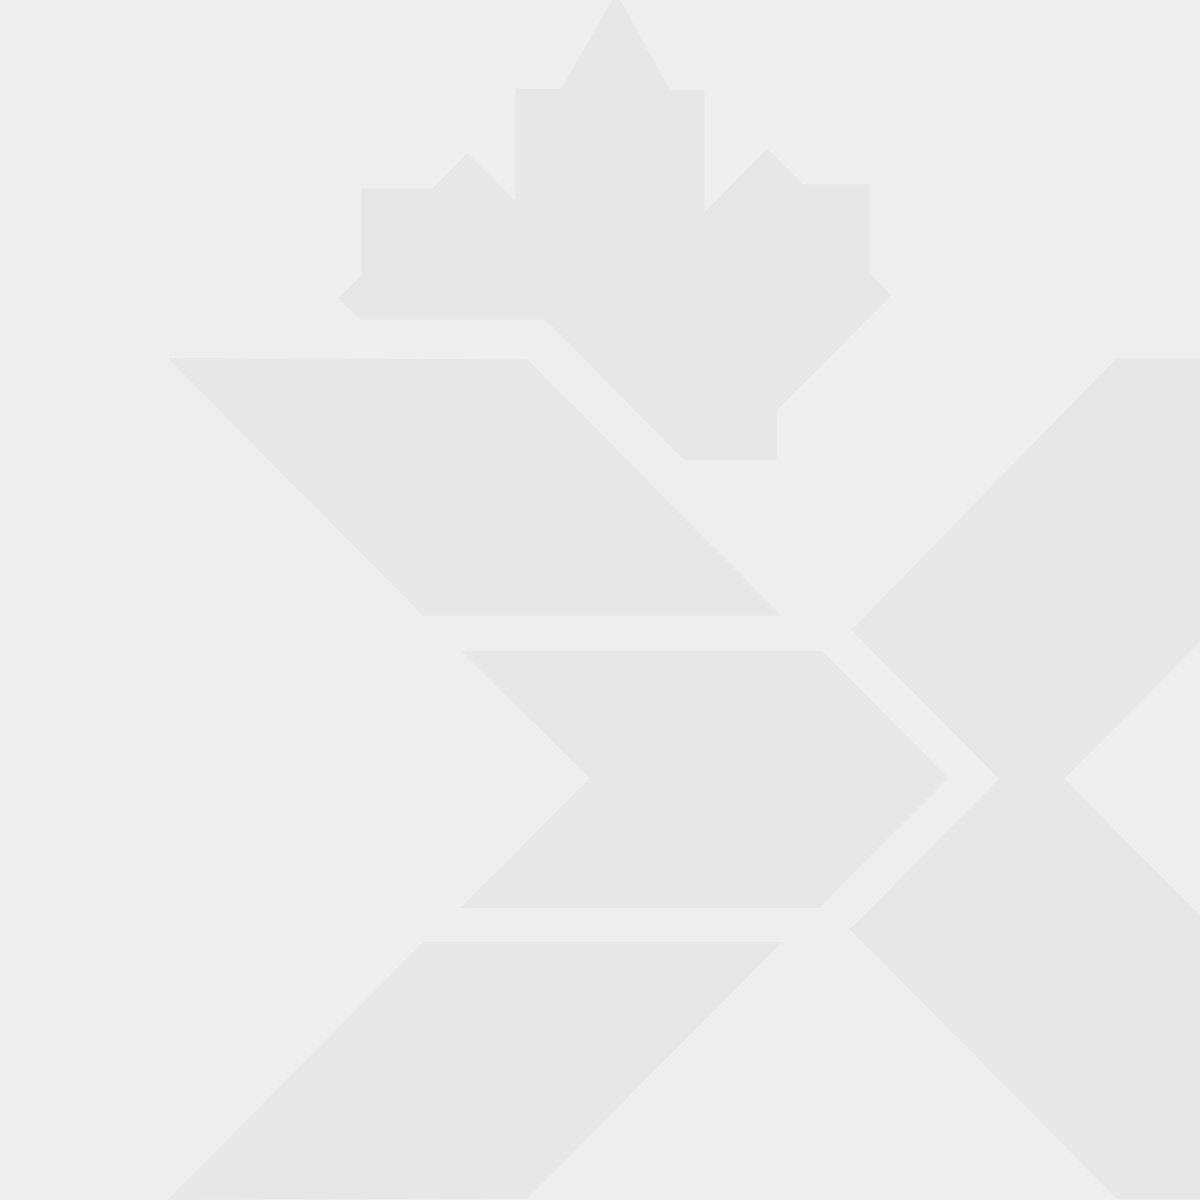 Club Rochelier Mens Slim Leather Wallet Black CRP354-2-BLK (EA1)